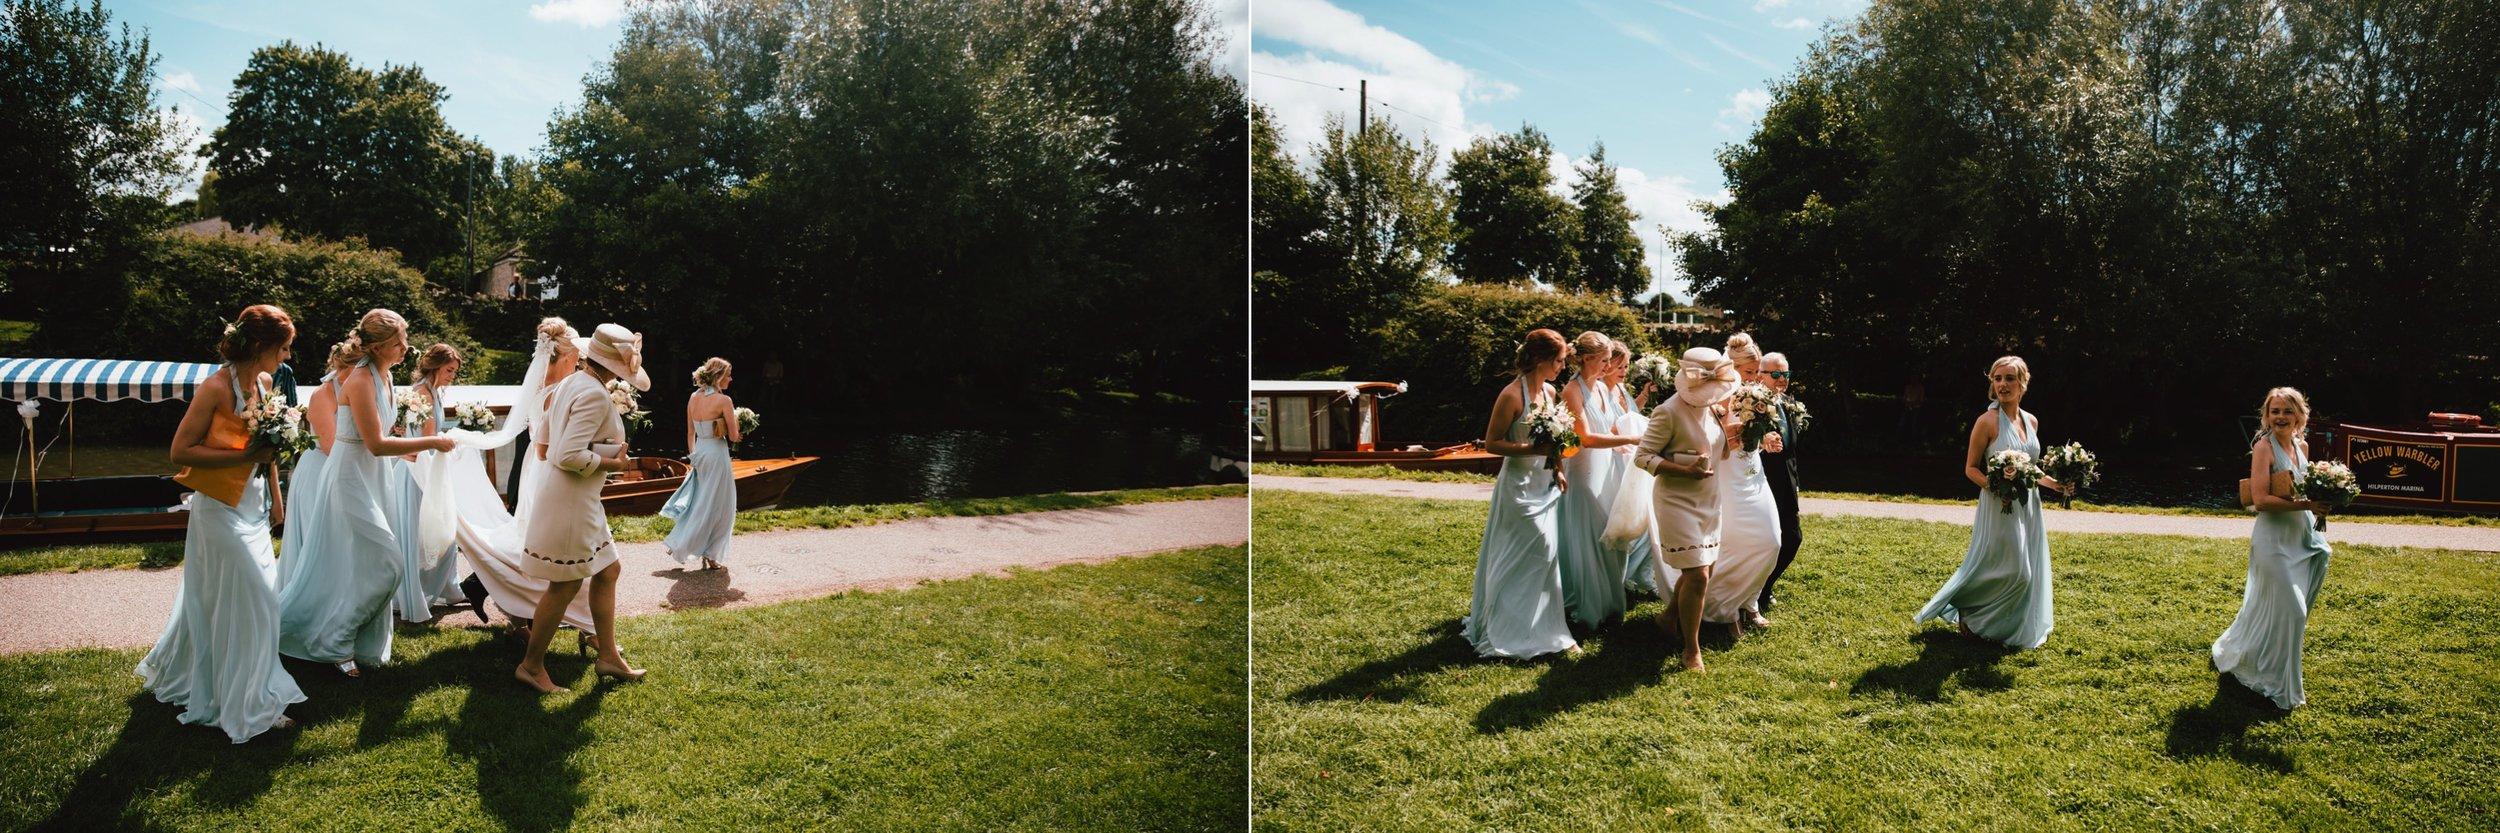 James & Hannah | Oak & Blossom0005.jpg